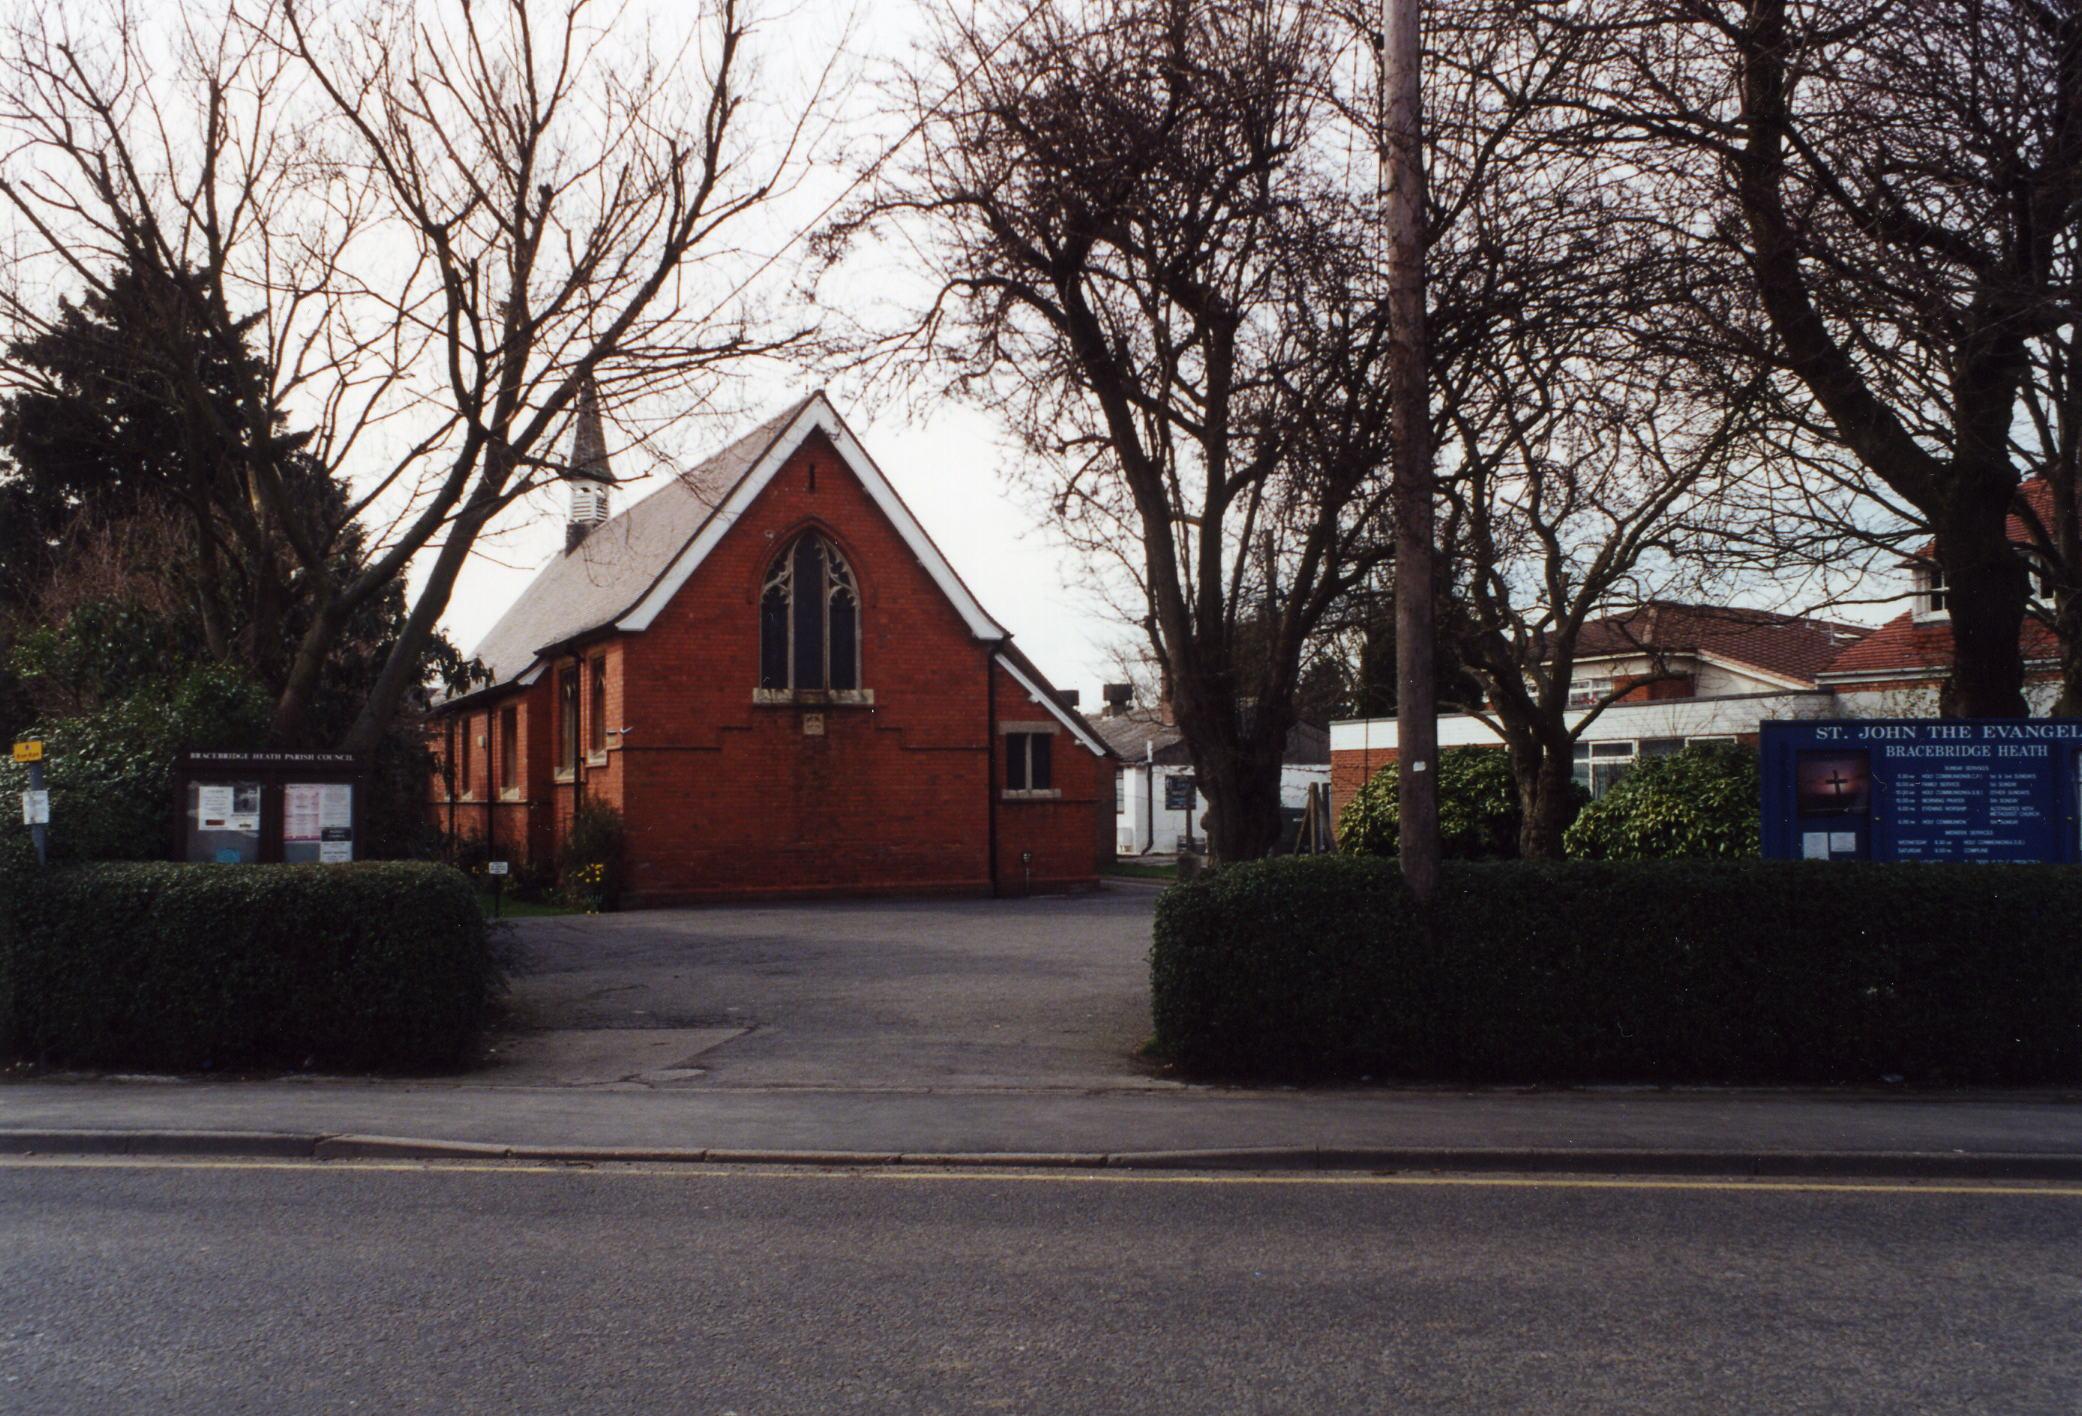 Bracebridge Heath St. John chapel